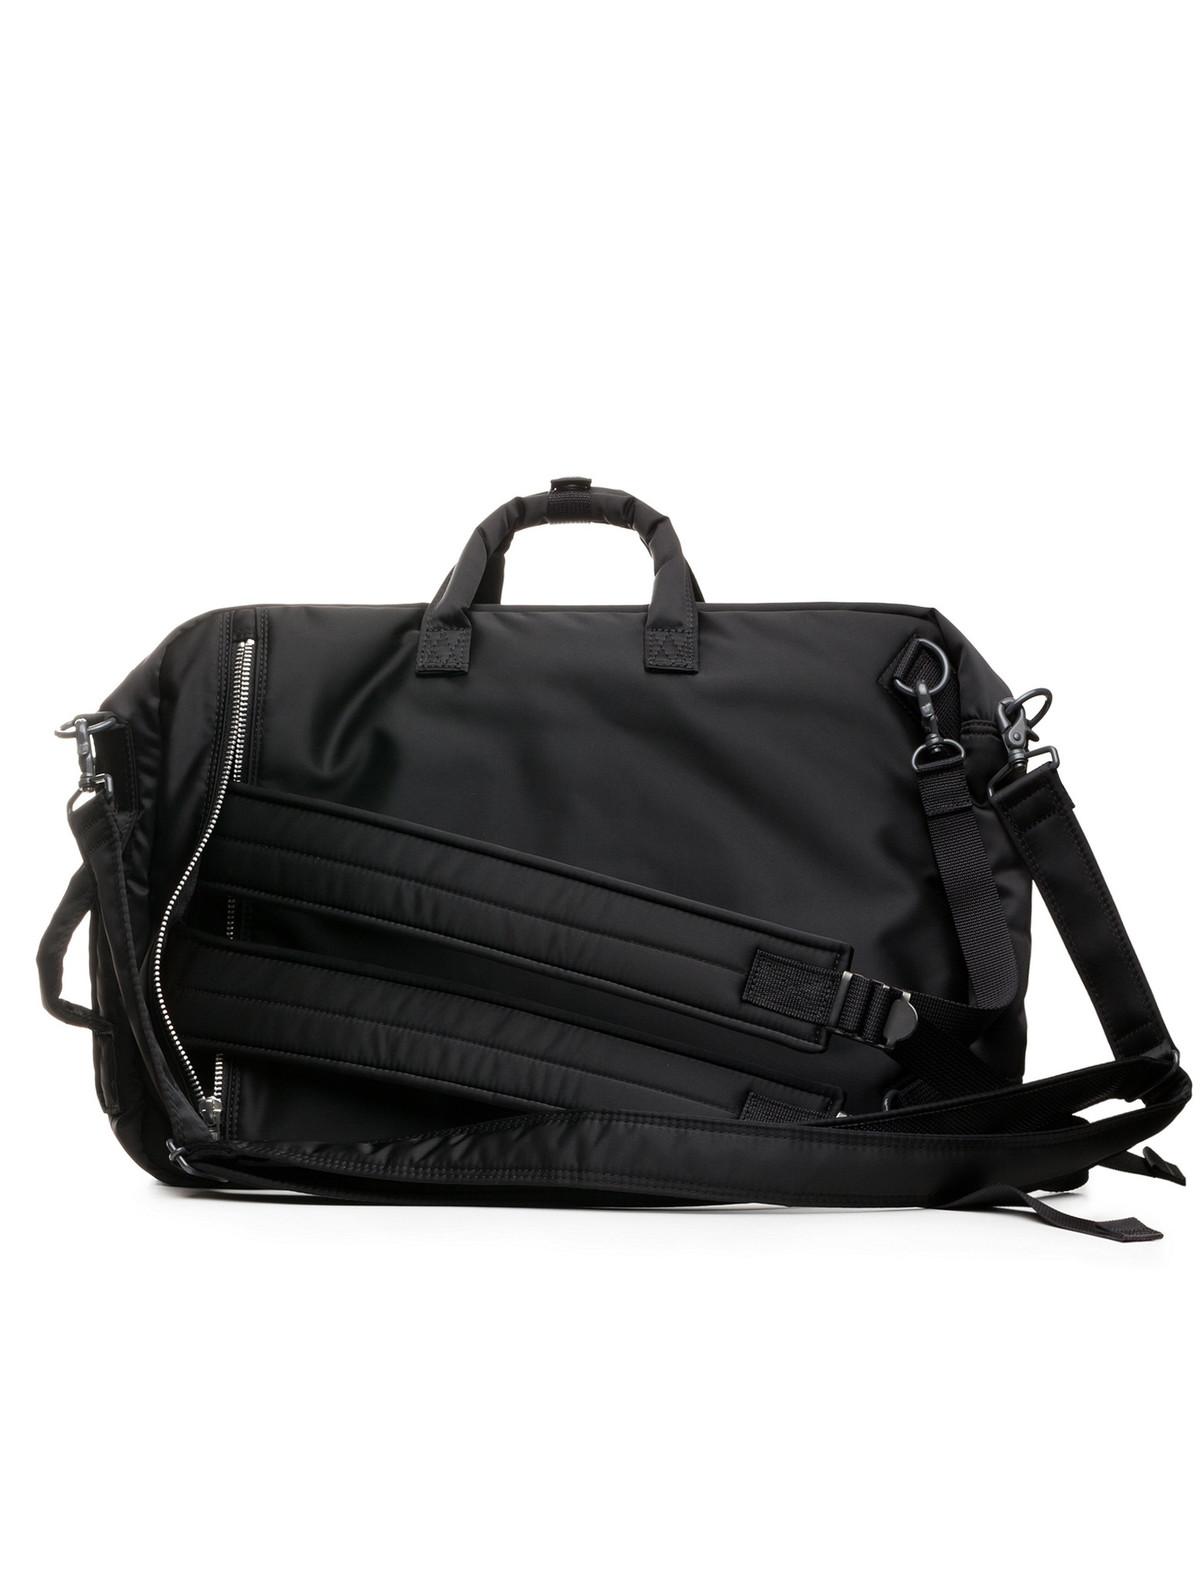 936a7f44c28 ... Porter Tanker 3Way Briefcase - Black Garmentory online retailer 4f5b6  bf06b ...